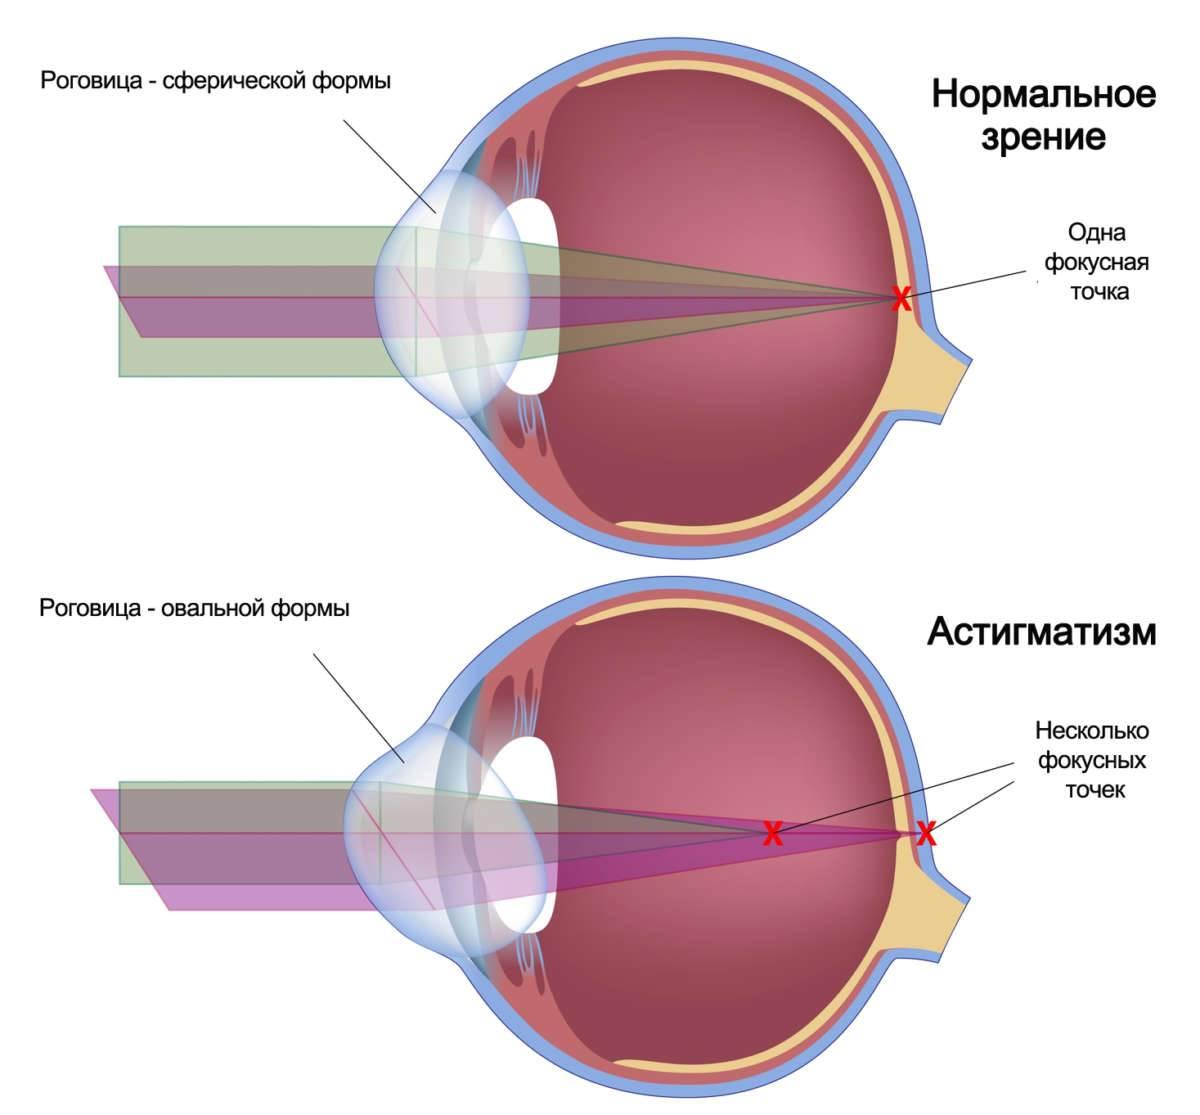 Астигматизм - причины, симптомы, диагностика и лечение астигматизма глаз | ао «медицина» (клиника академика ройтберга)